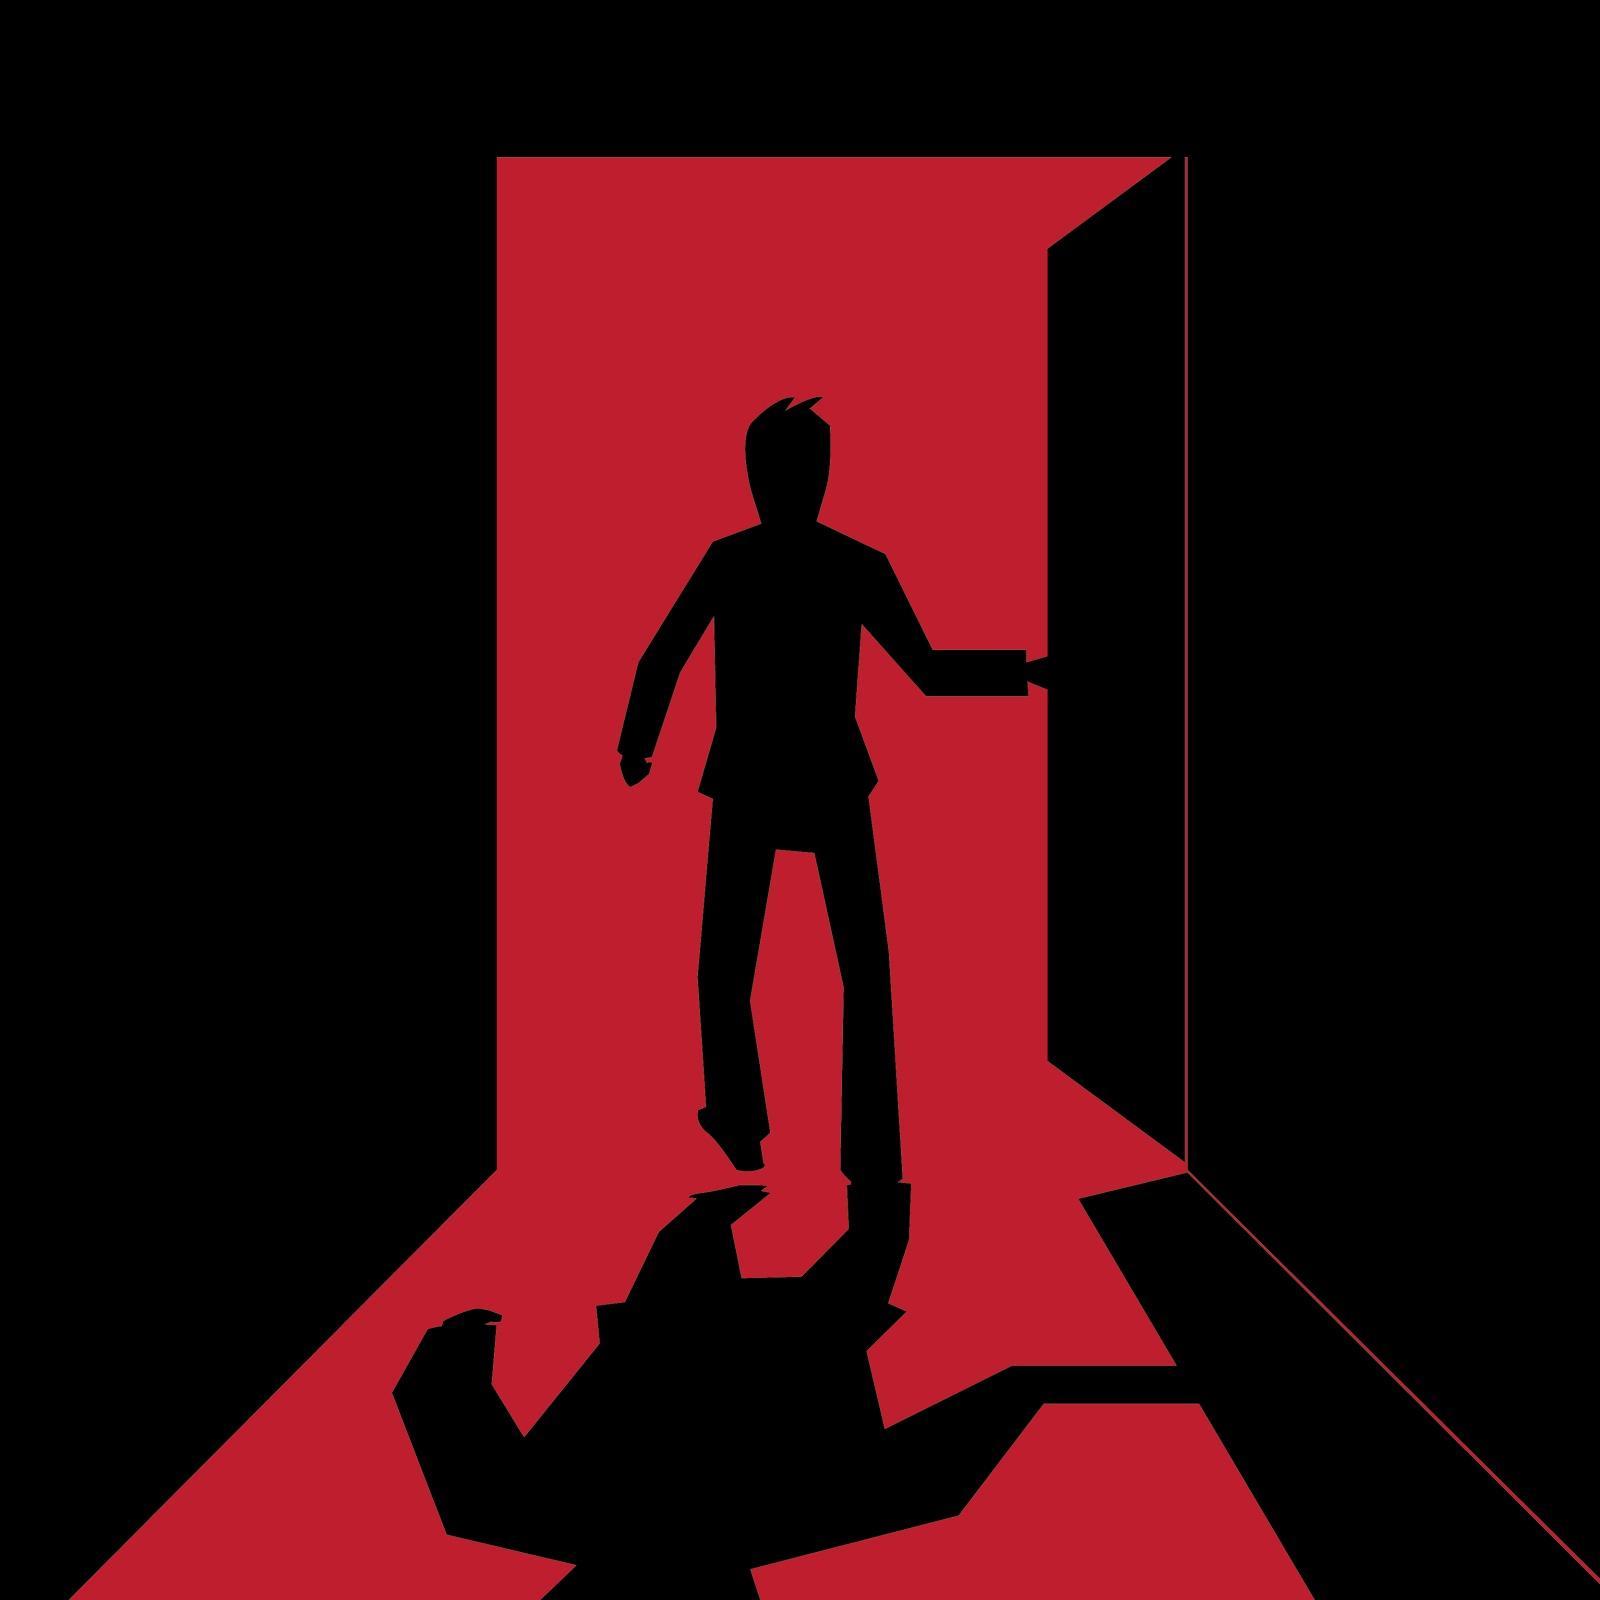 C:\Users\Admin\Downloads\Images\Escape Room.jpg